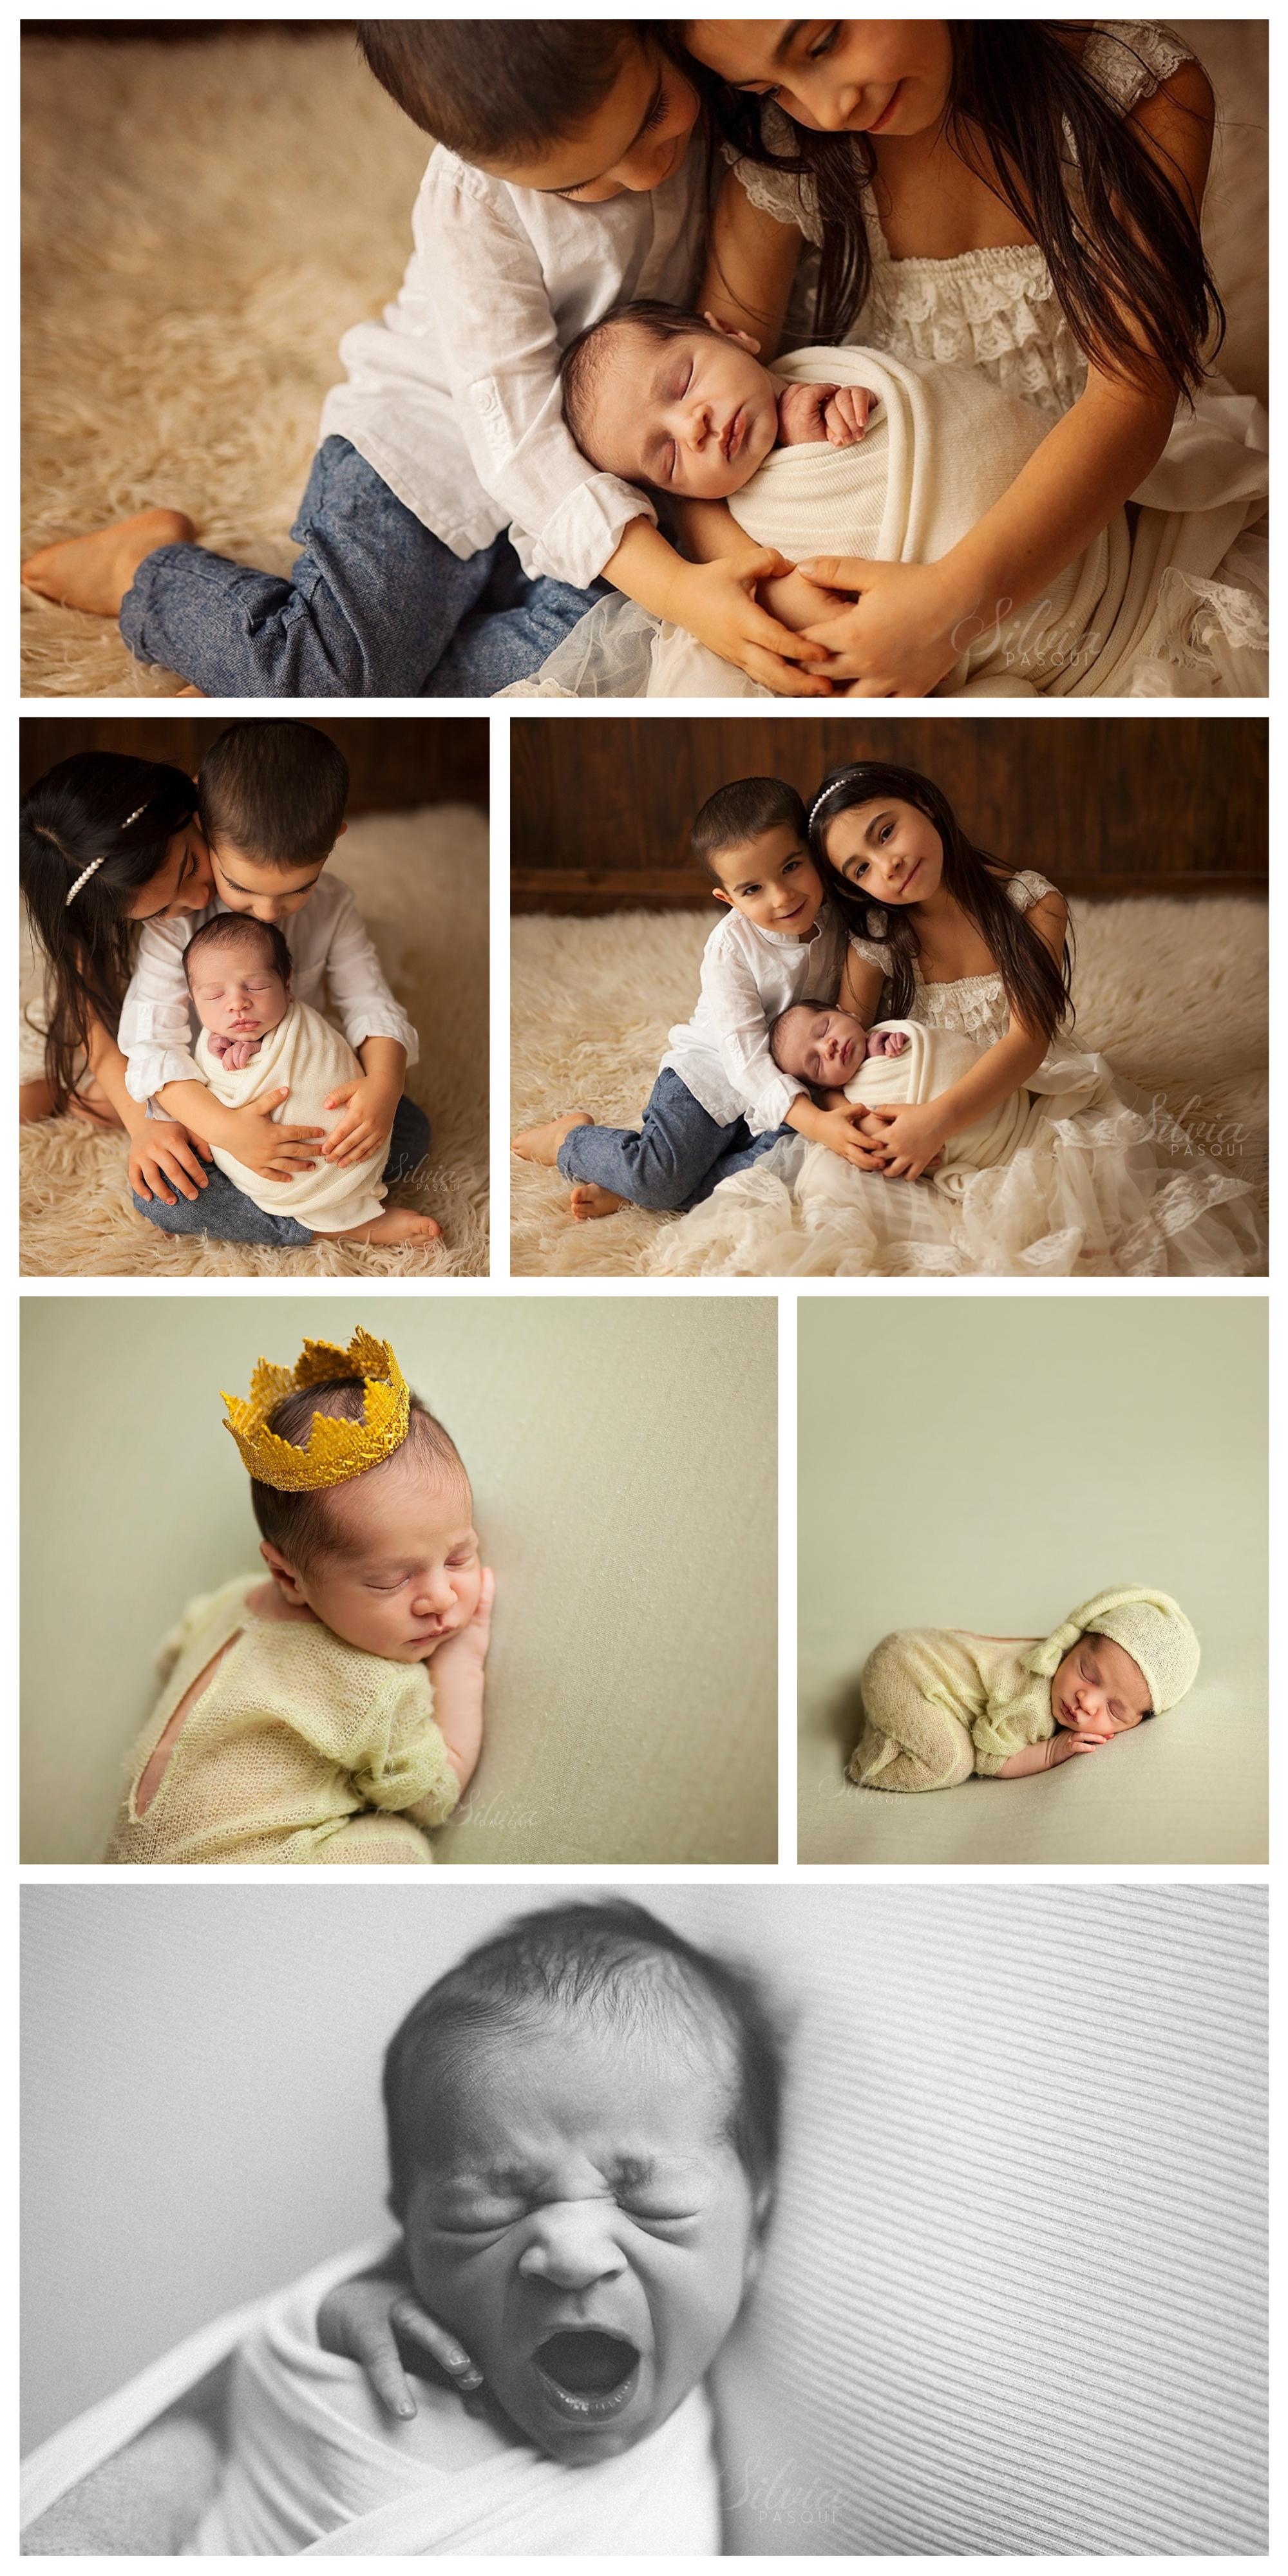 fotografa neonati famosa